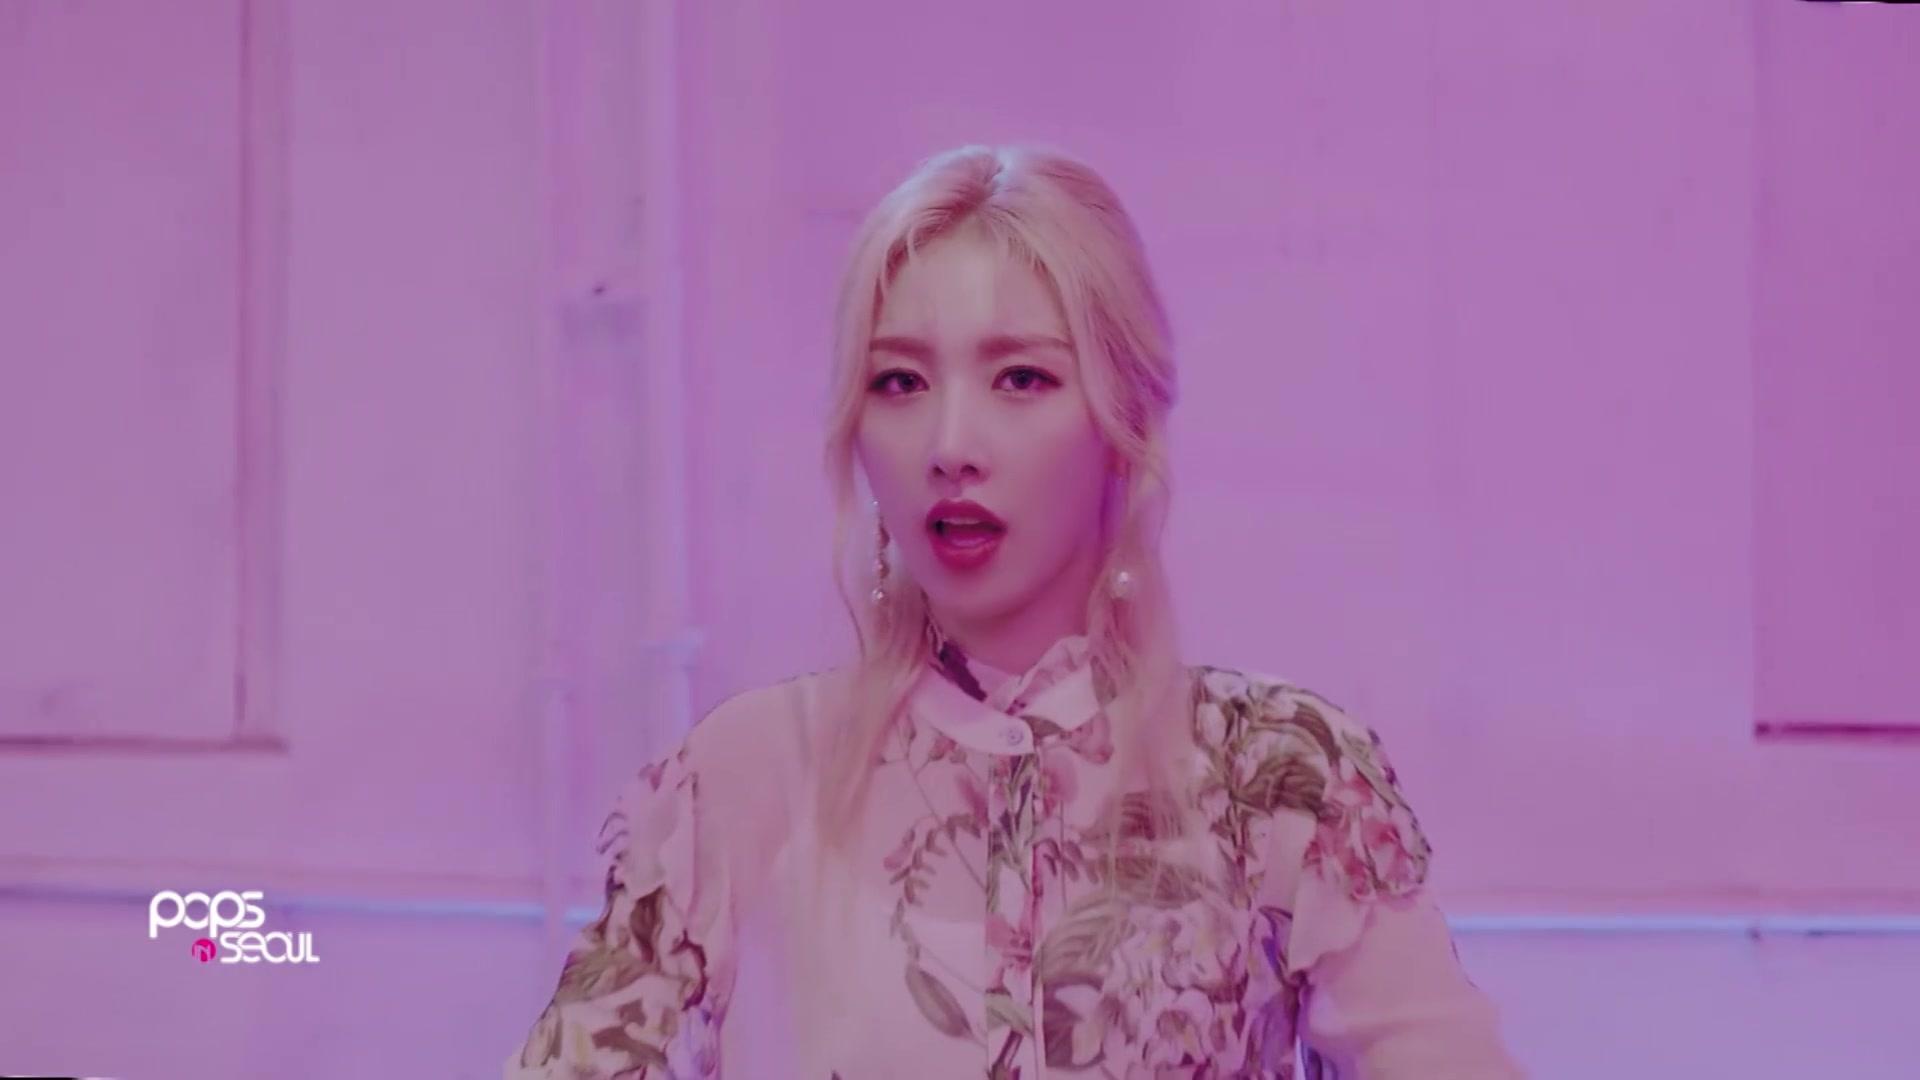 Pops in Seoul Episode 3557: SONAMOO, Urban Zakapa, EXID, B1A4